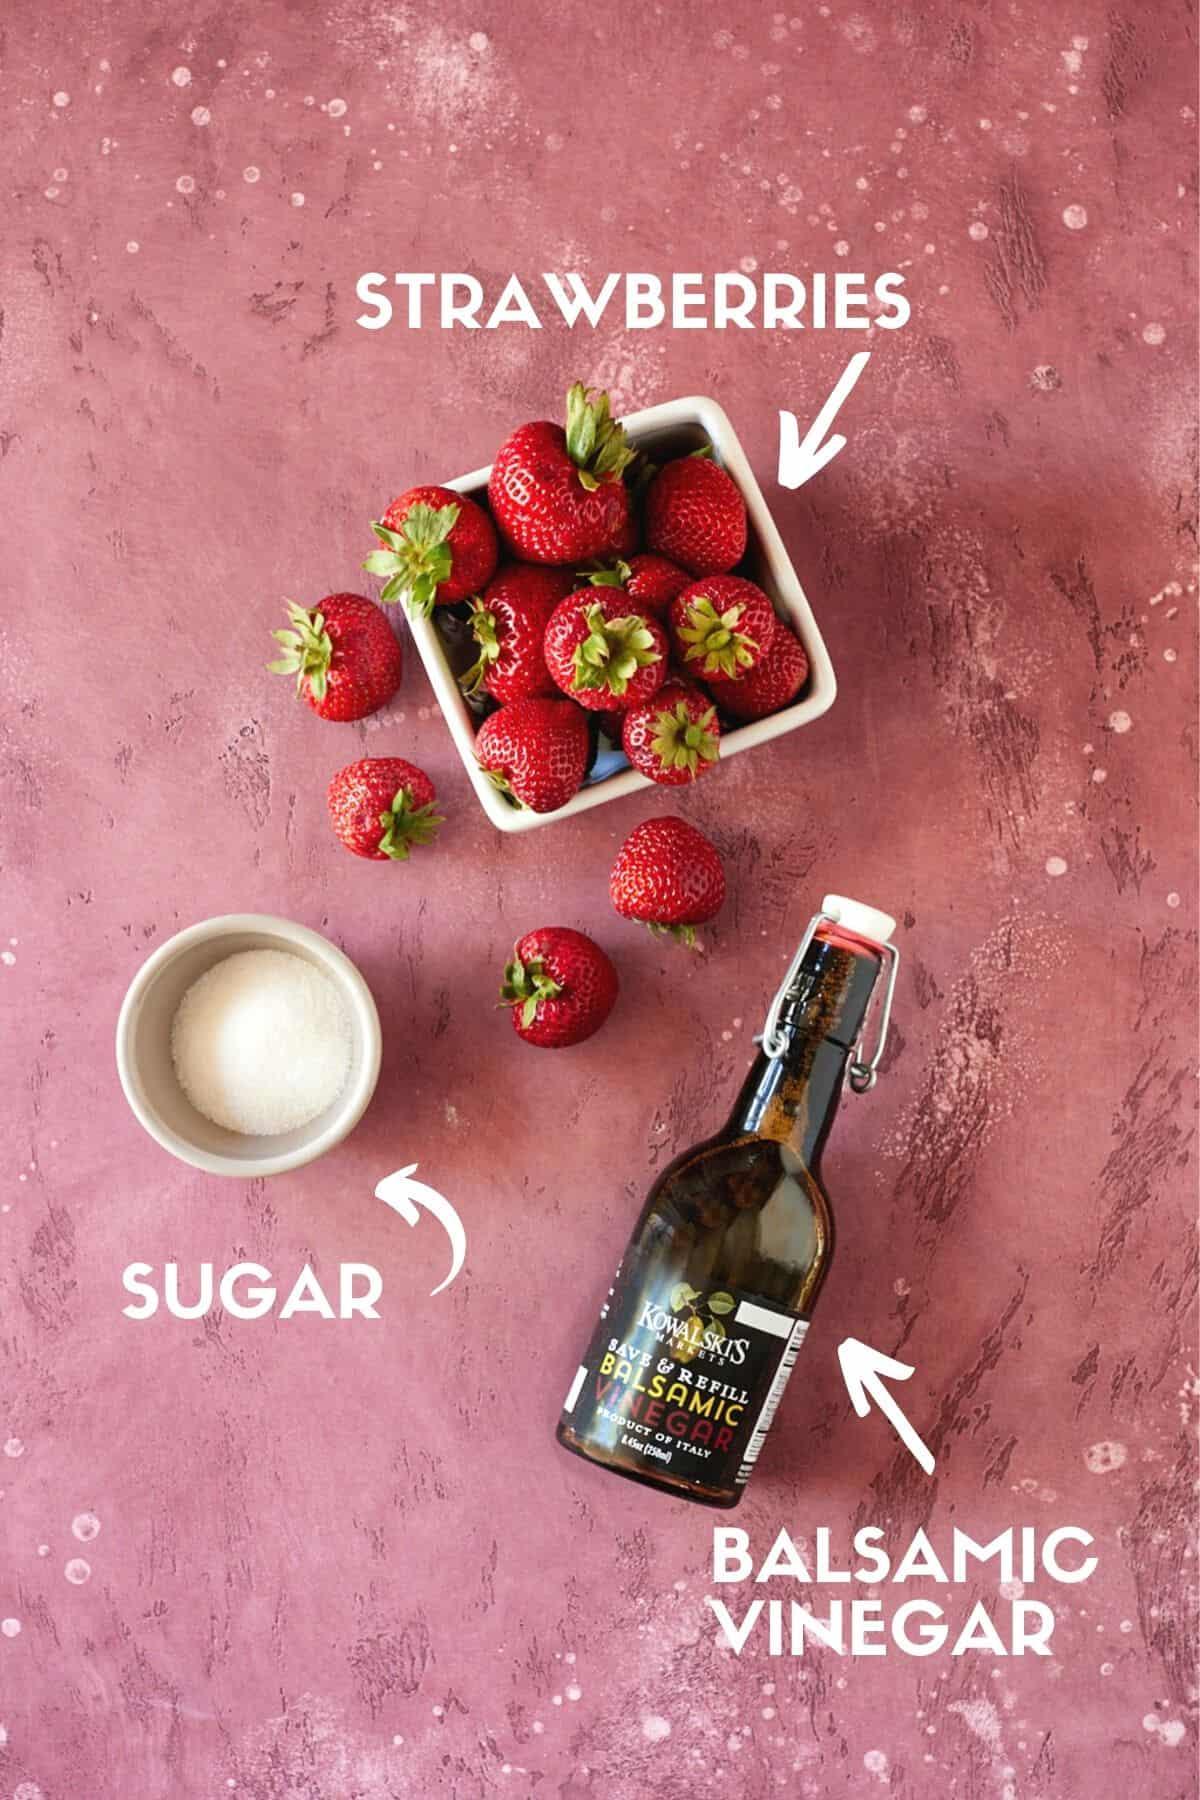 Strawberries, sugar and balsamic vinegar on a pink board.